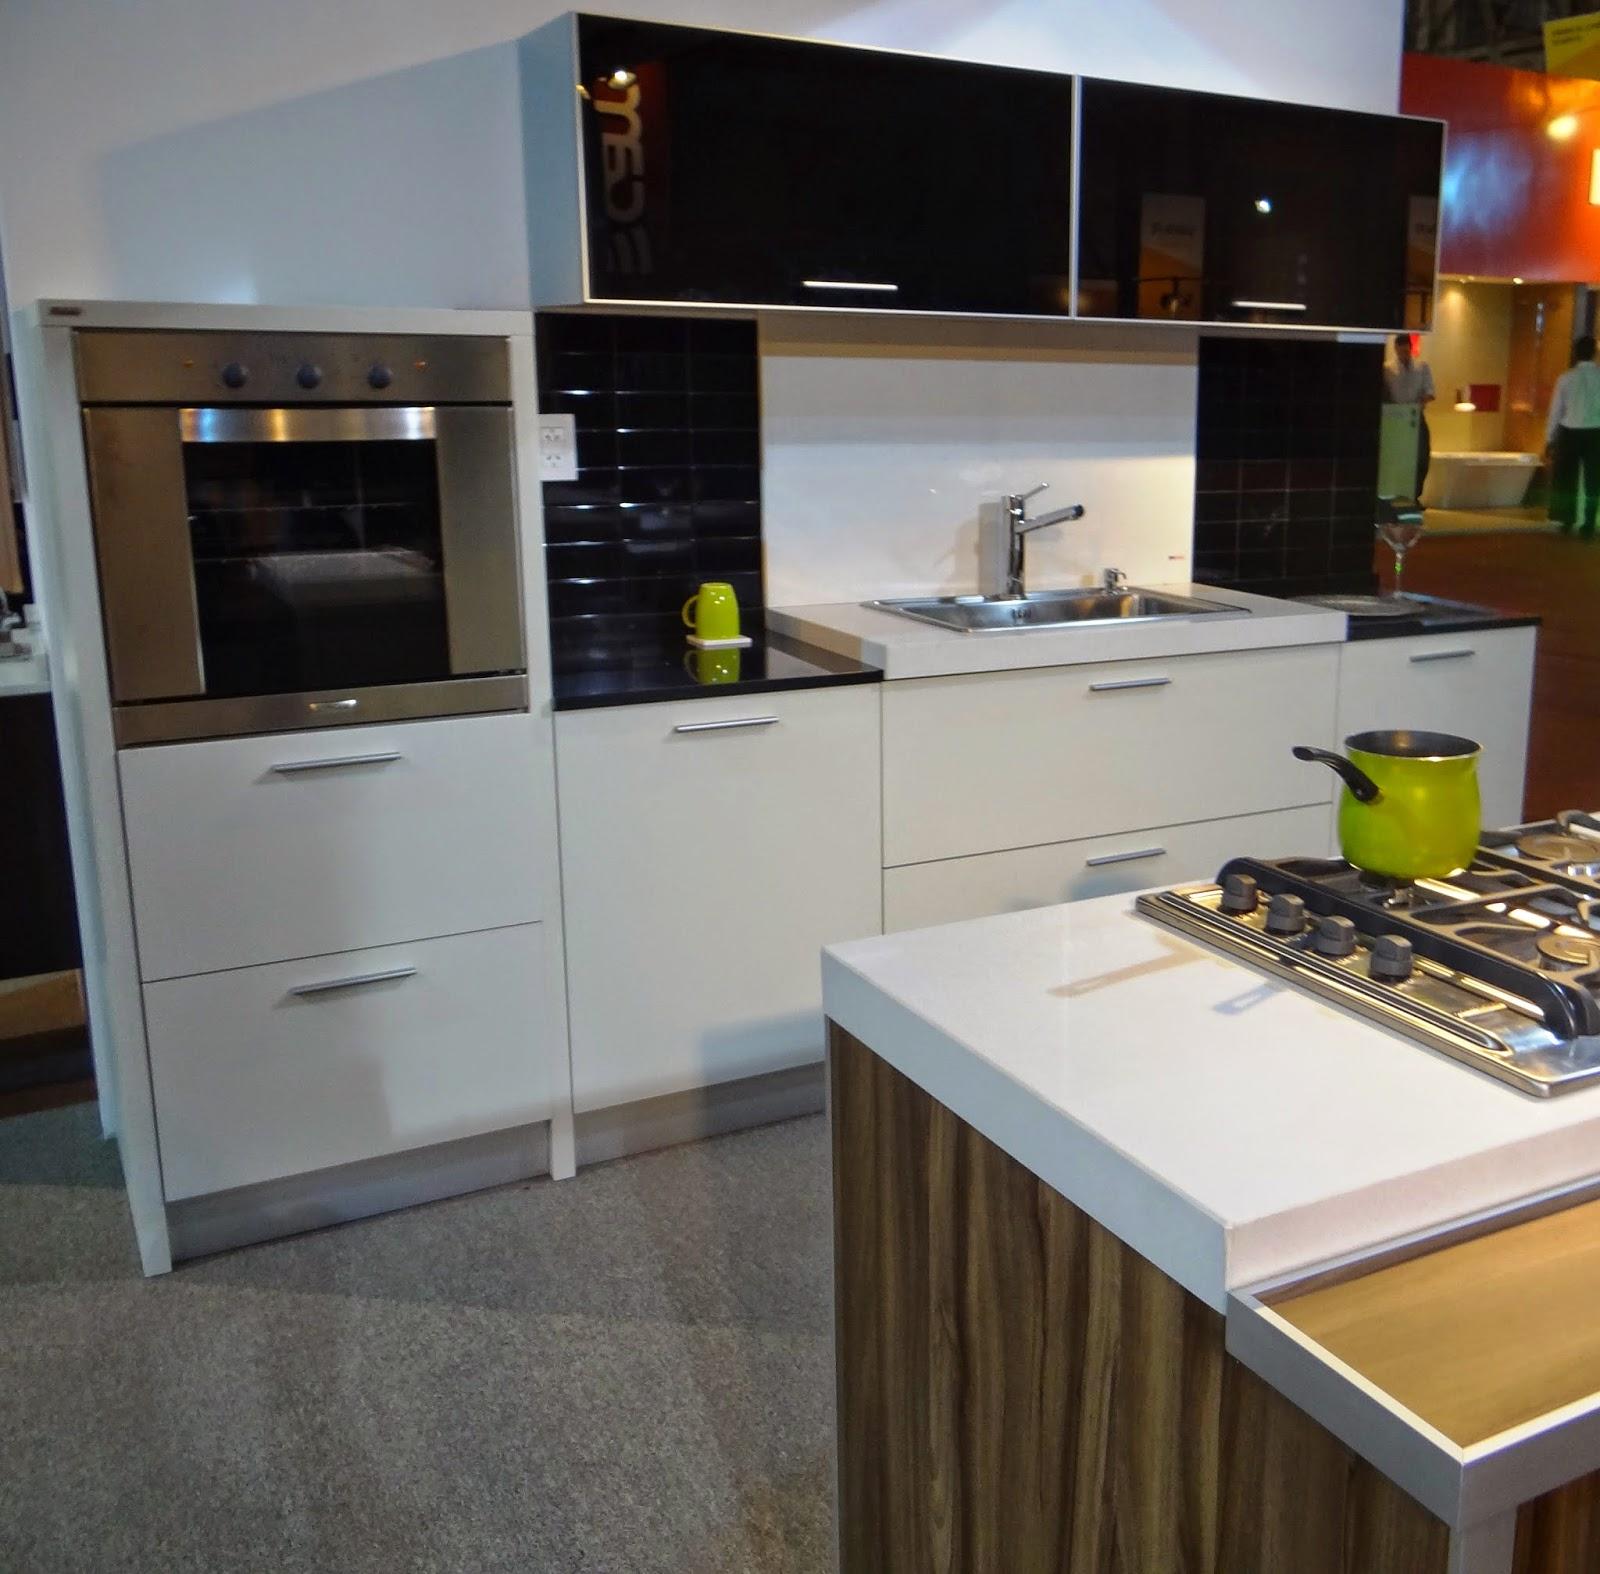 Casa presisso procrear for Planos de cocina en linea